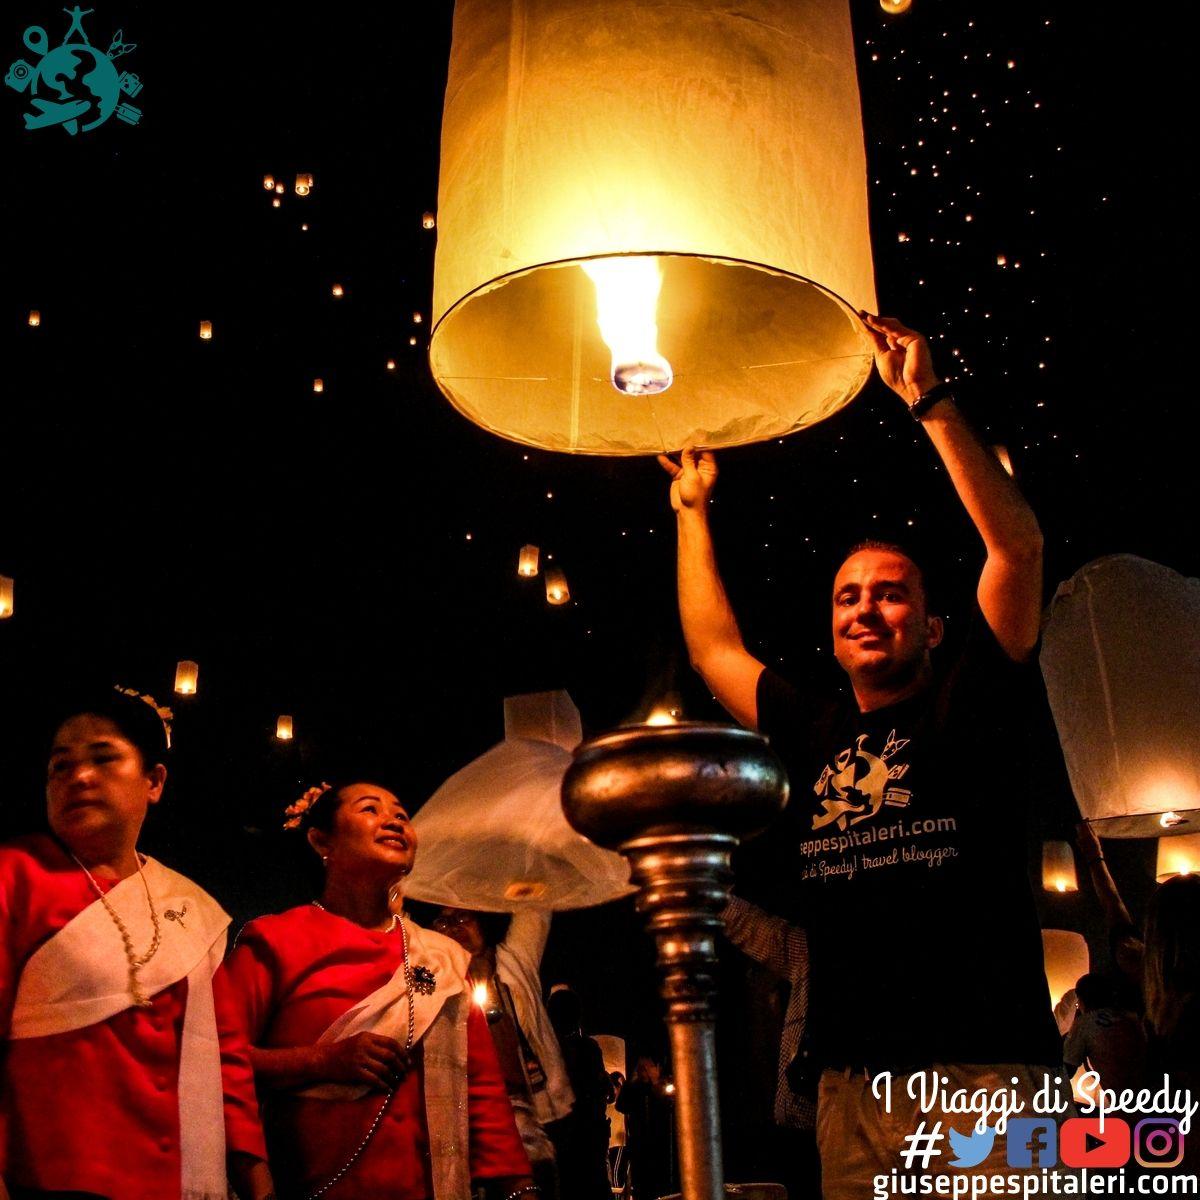 chiang_mai_festival_loy_krathong_thailandia_www.giuseppespitaleri.com_053